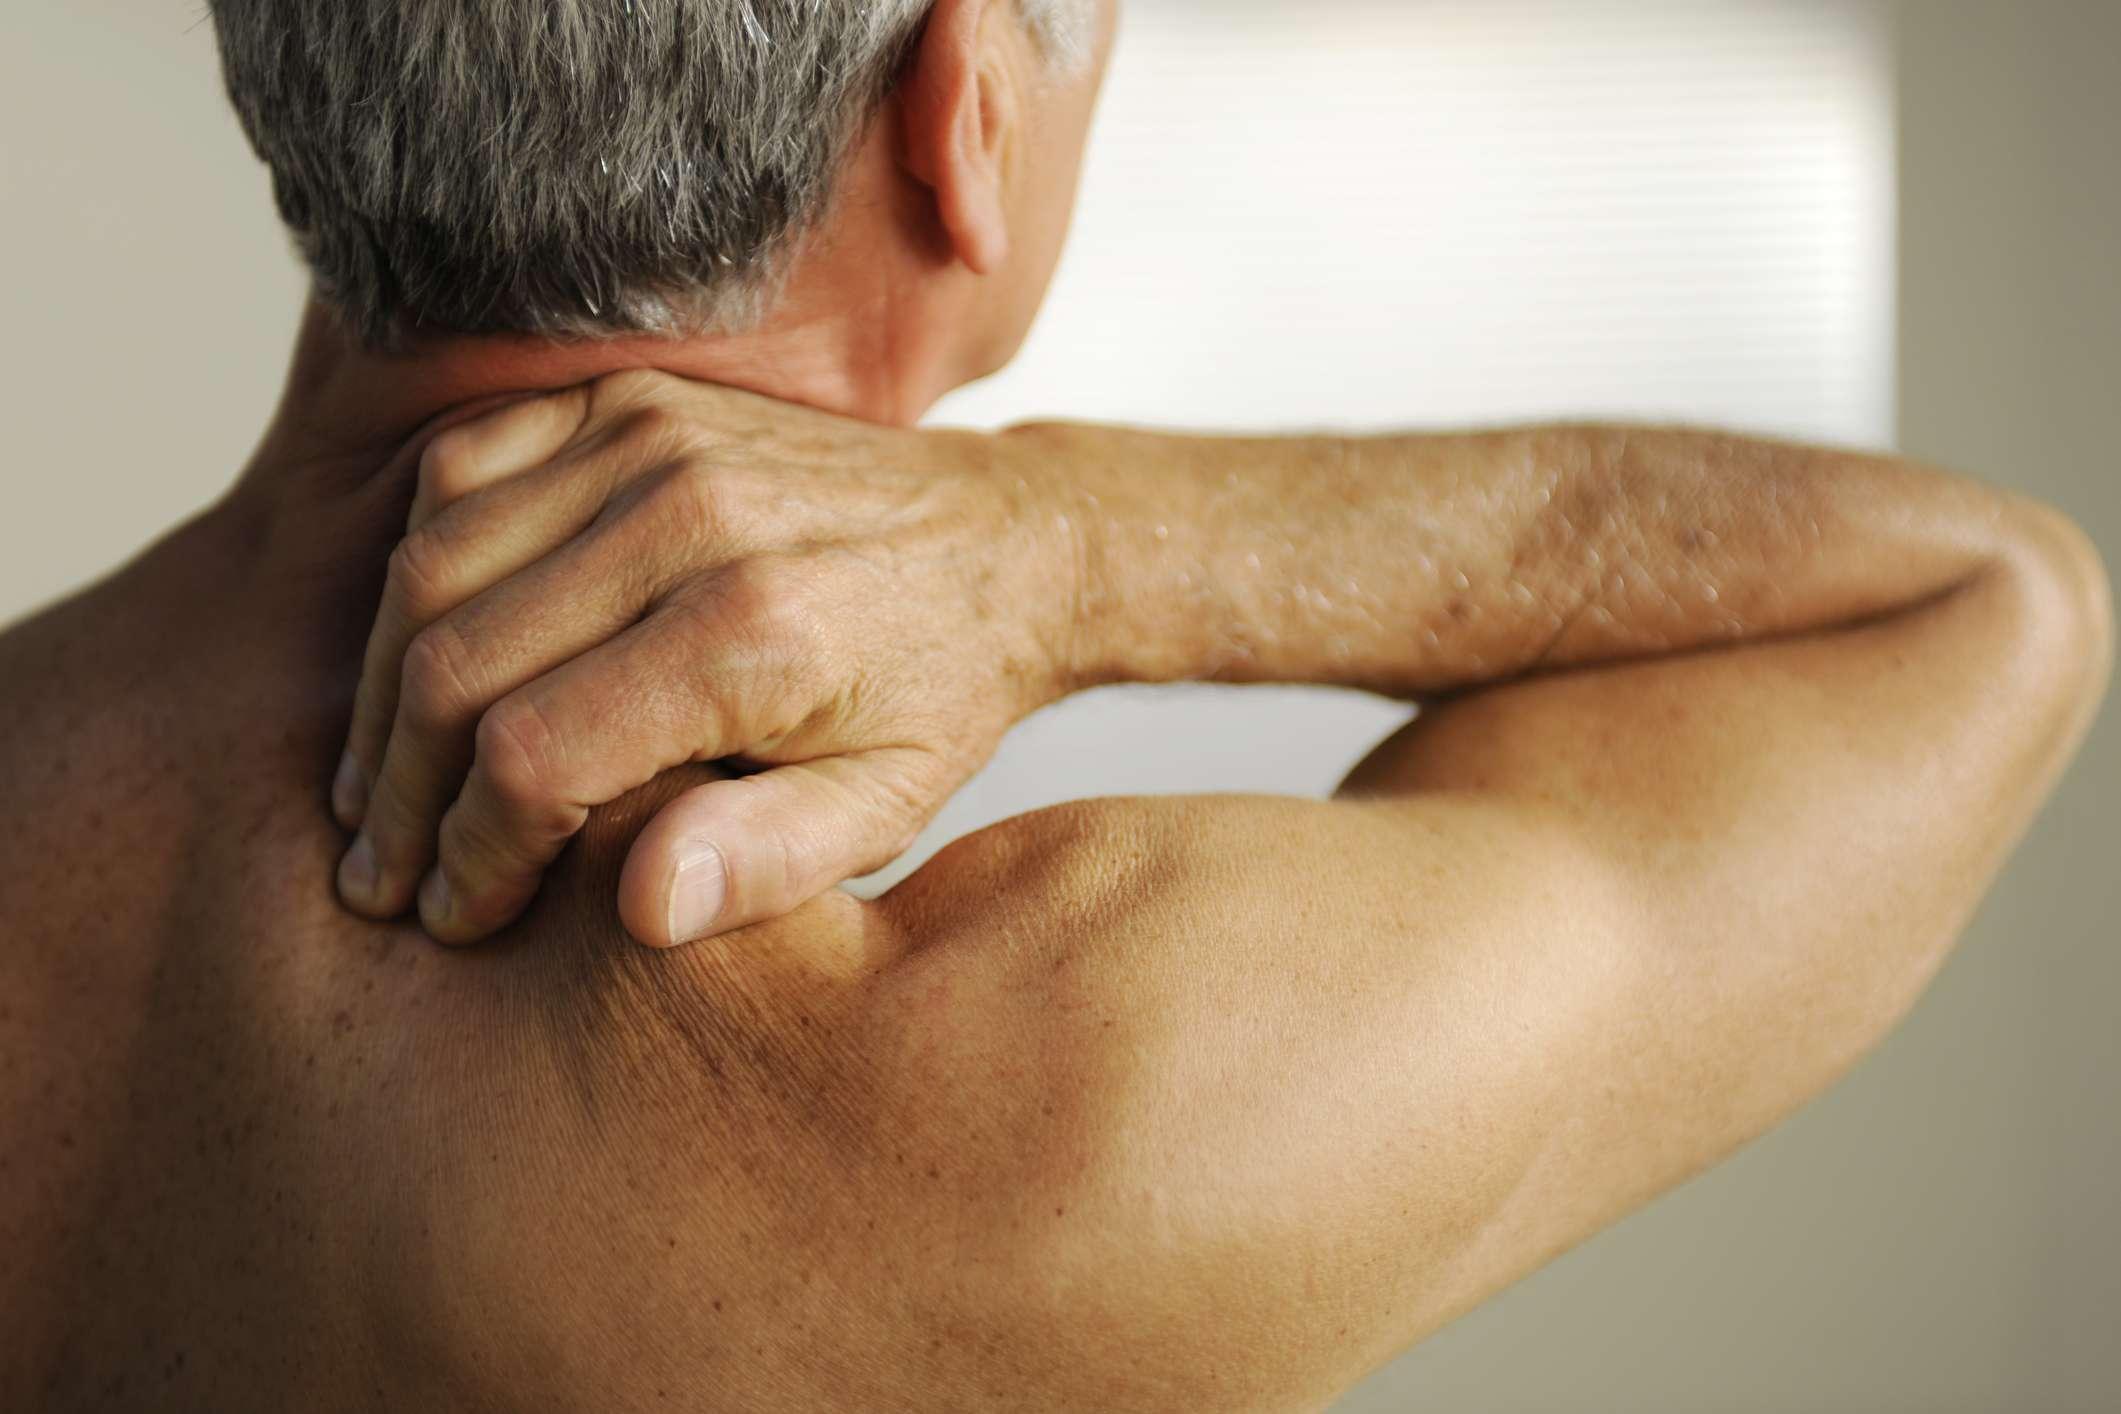 Shirtless man rubbing his neck in pain